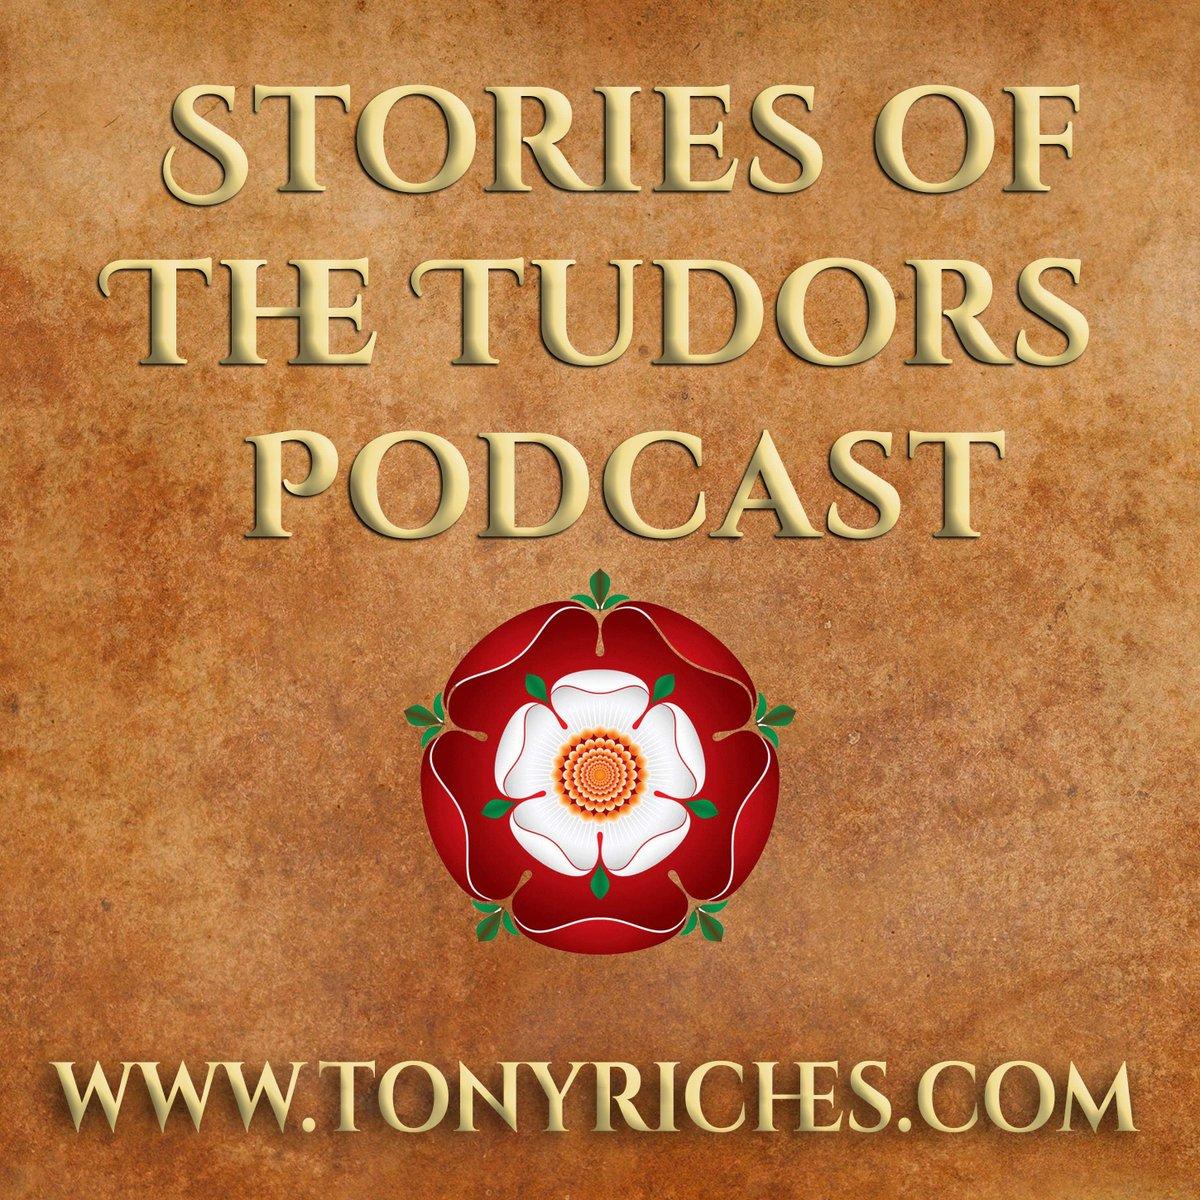 Stories of the Tudors Podcast  - Catherine of Aragon   #Tudors #Podcast